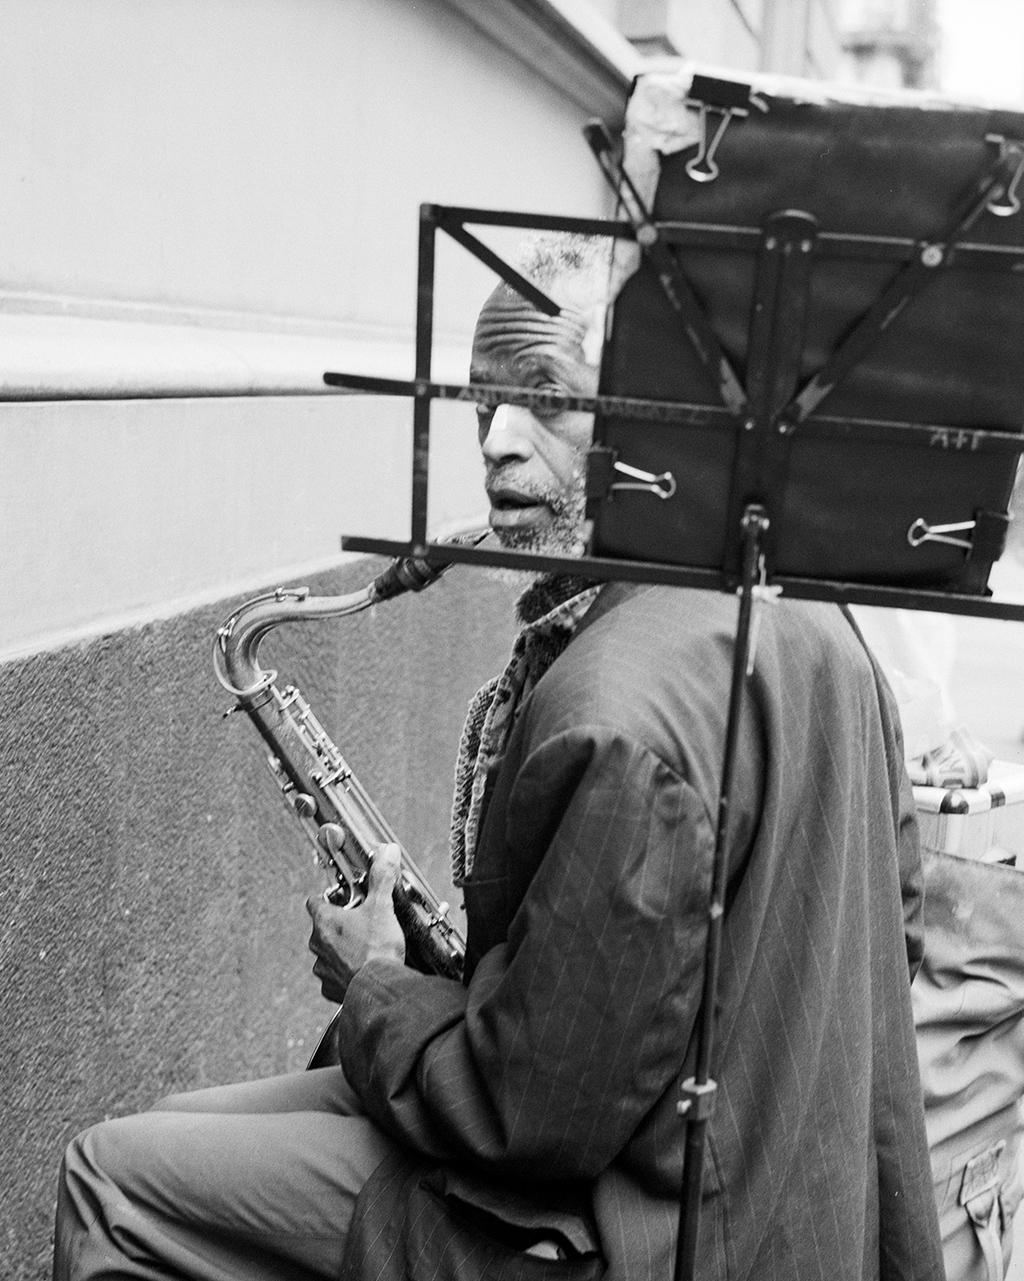 compagnon_trovatten_feature_street_musician